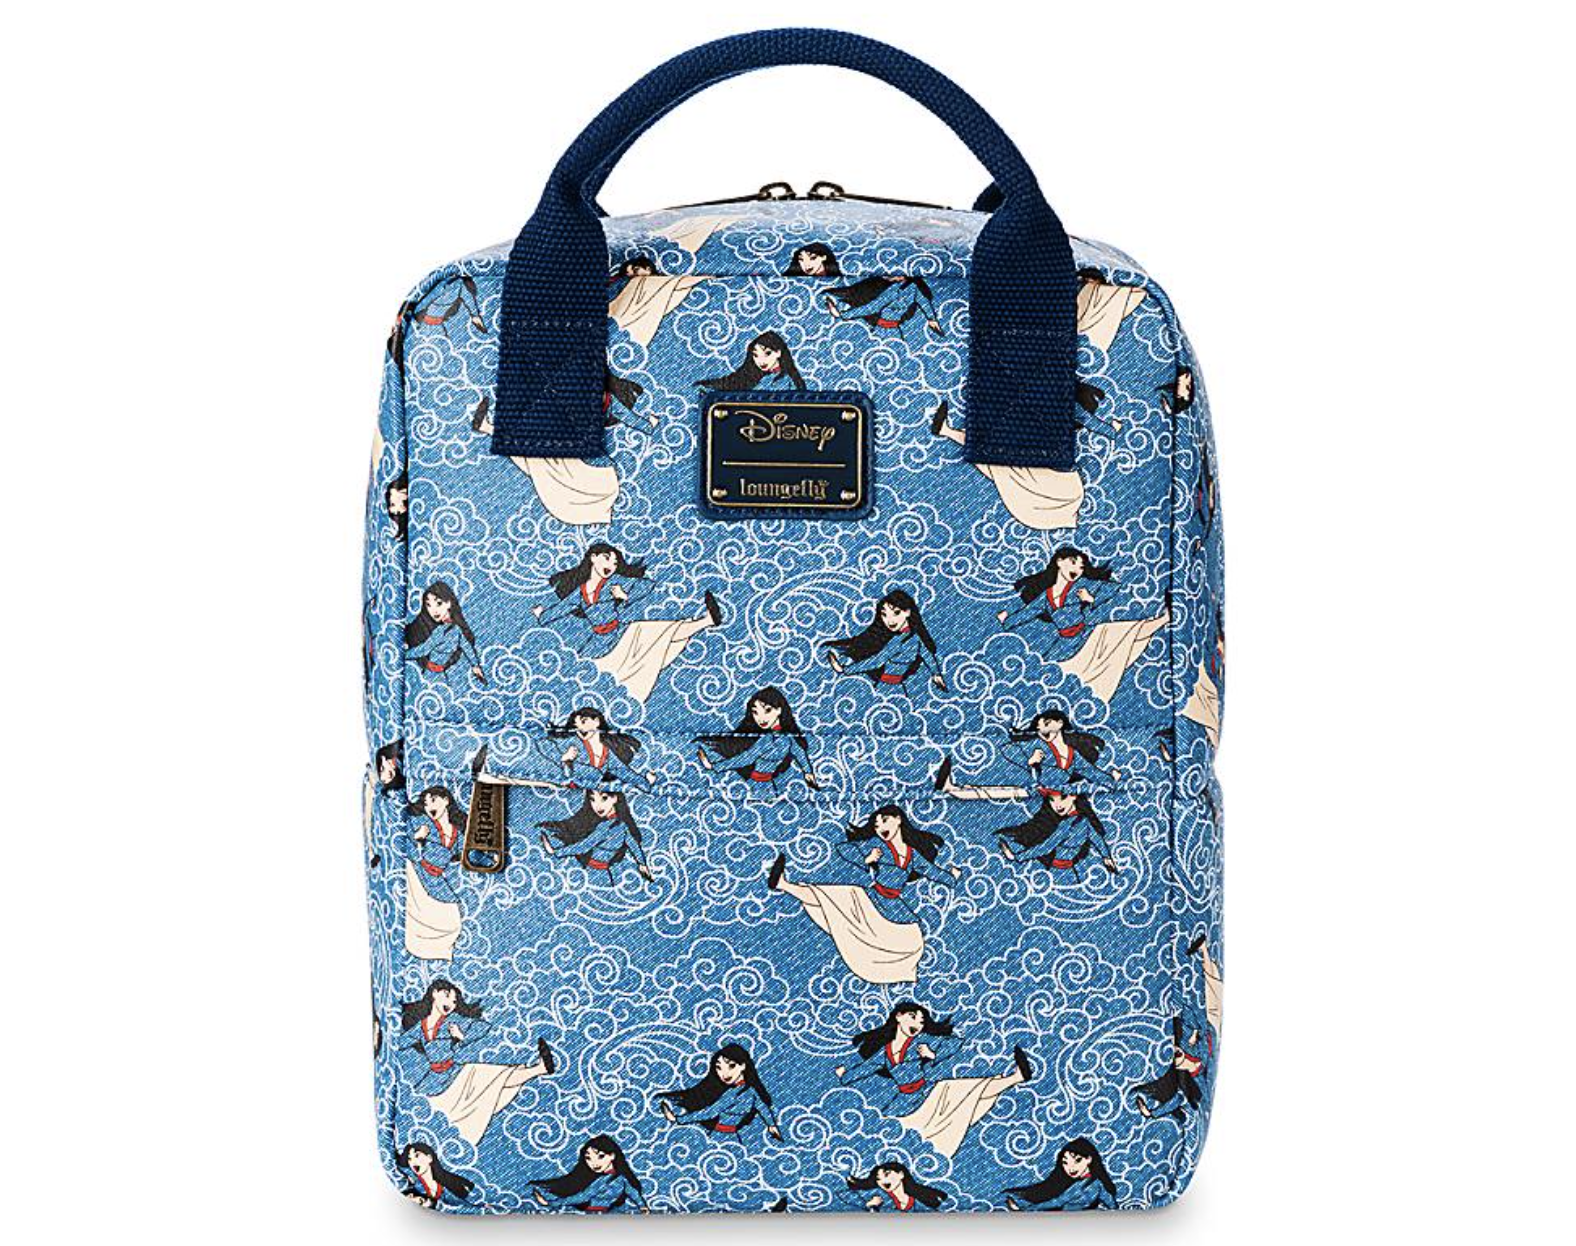 Mulan Compilation Tote Shopper Bag Disney